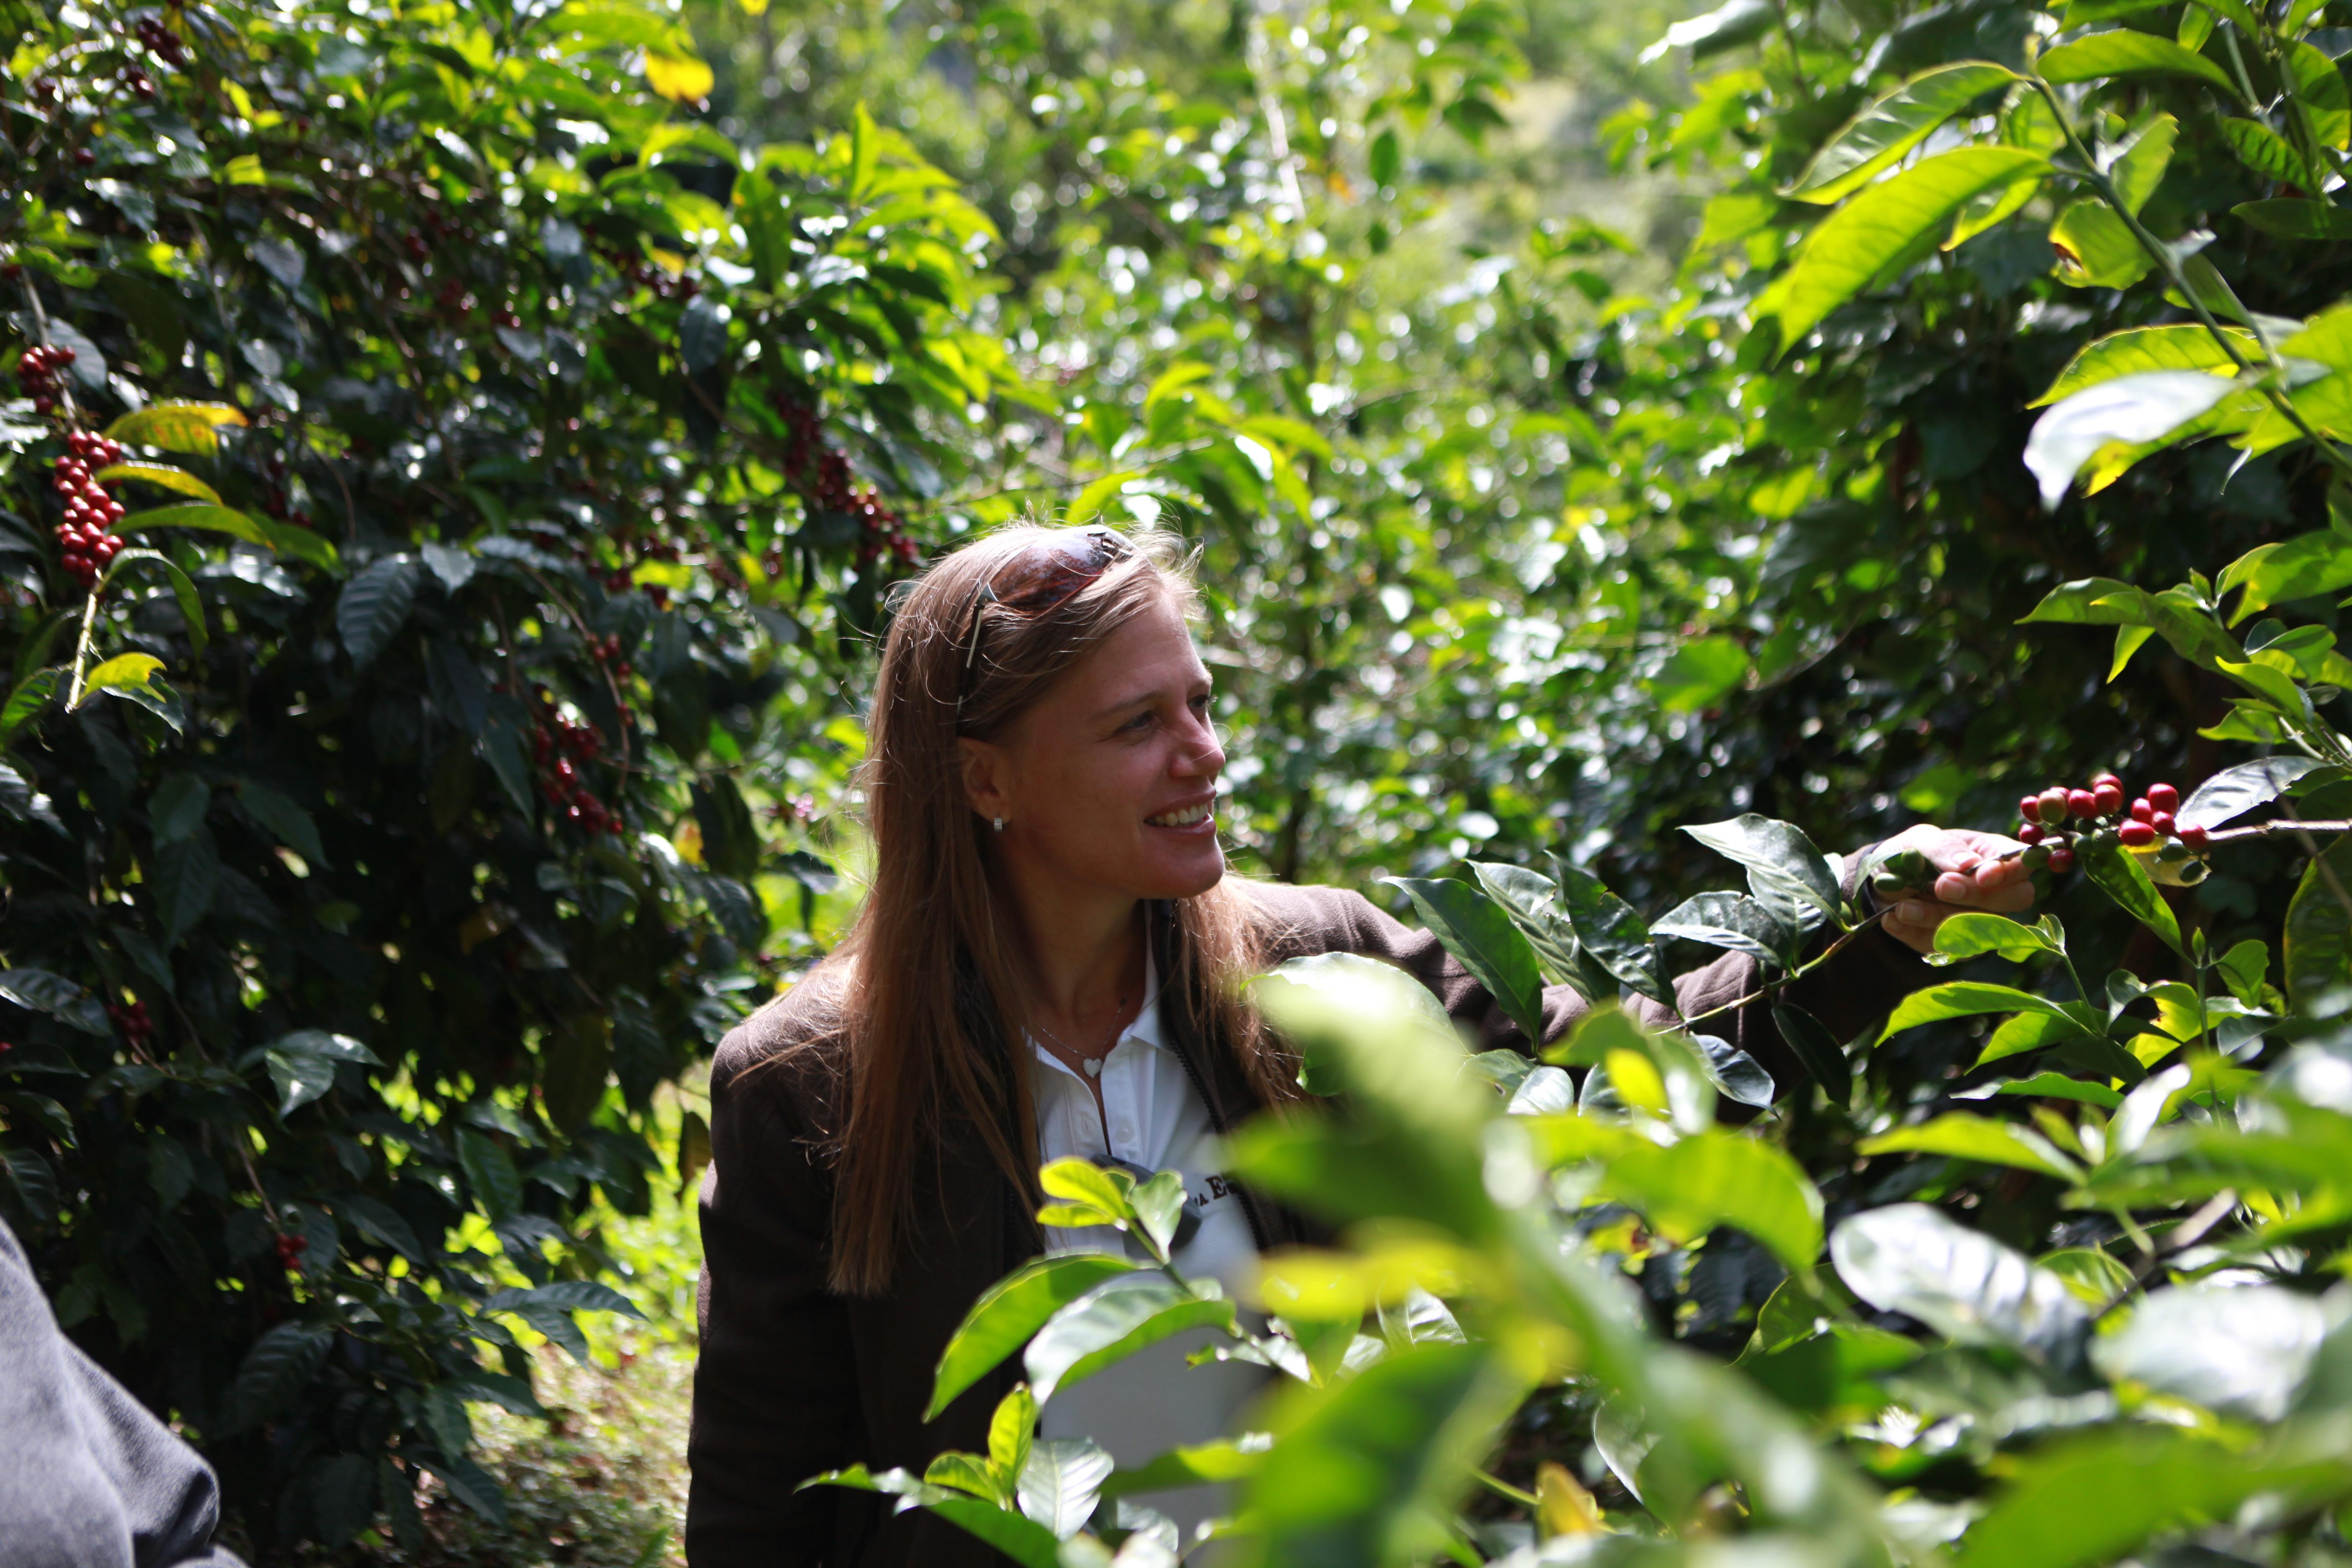 Datteren, Rachel Peterson følger med i alle de daglige led i kaffeproduktionen